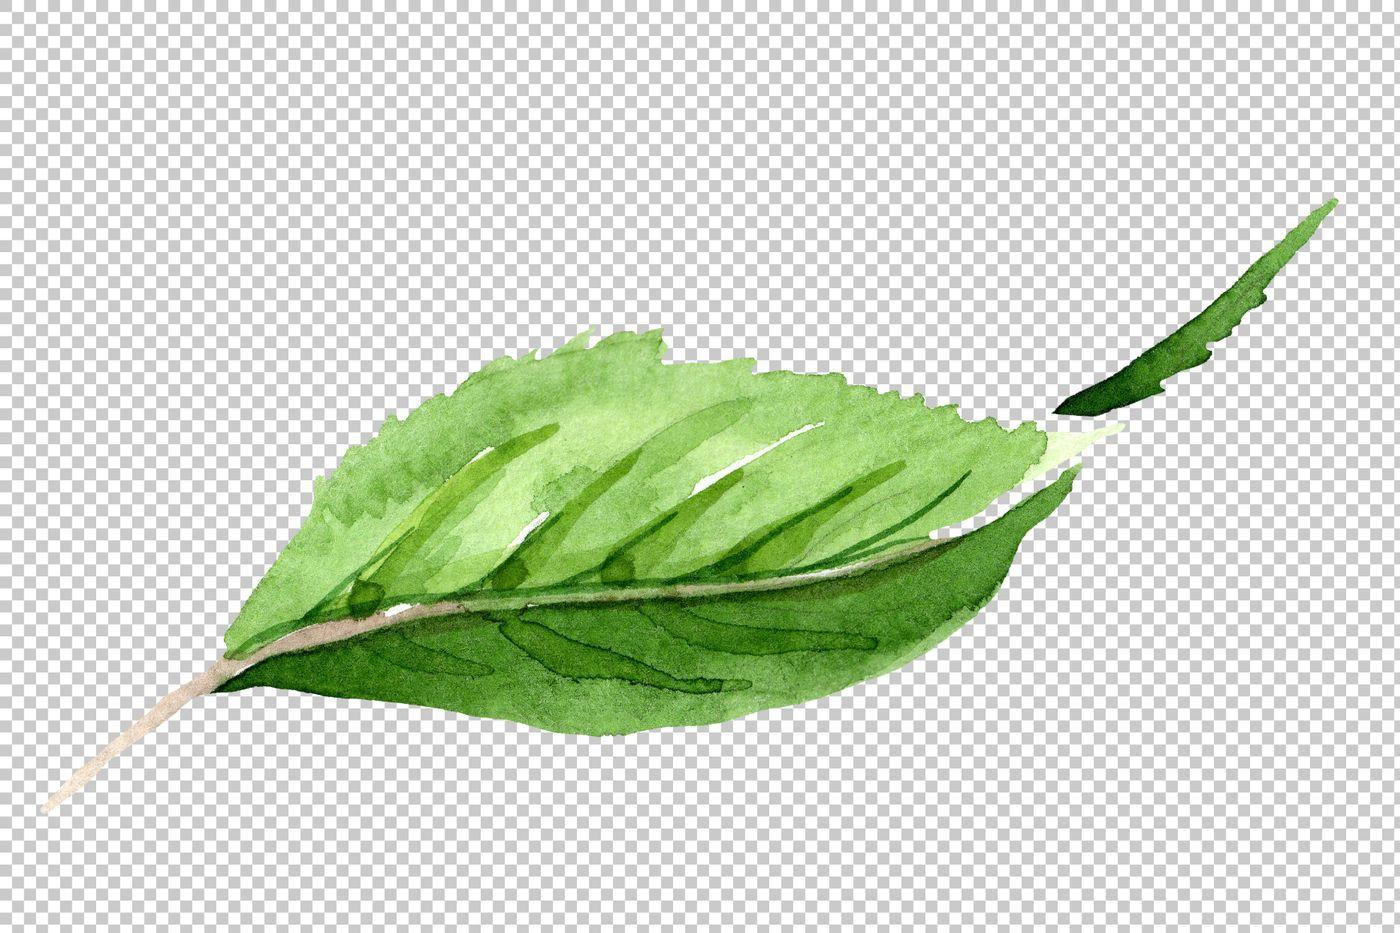 Tea Leaf Png Watercolor Set By Mystocks Thehungryjpeg Com Png Aff Leaf Tea Watercolor Adver Floral Botanical Plant Leaves Leaves